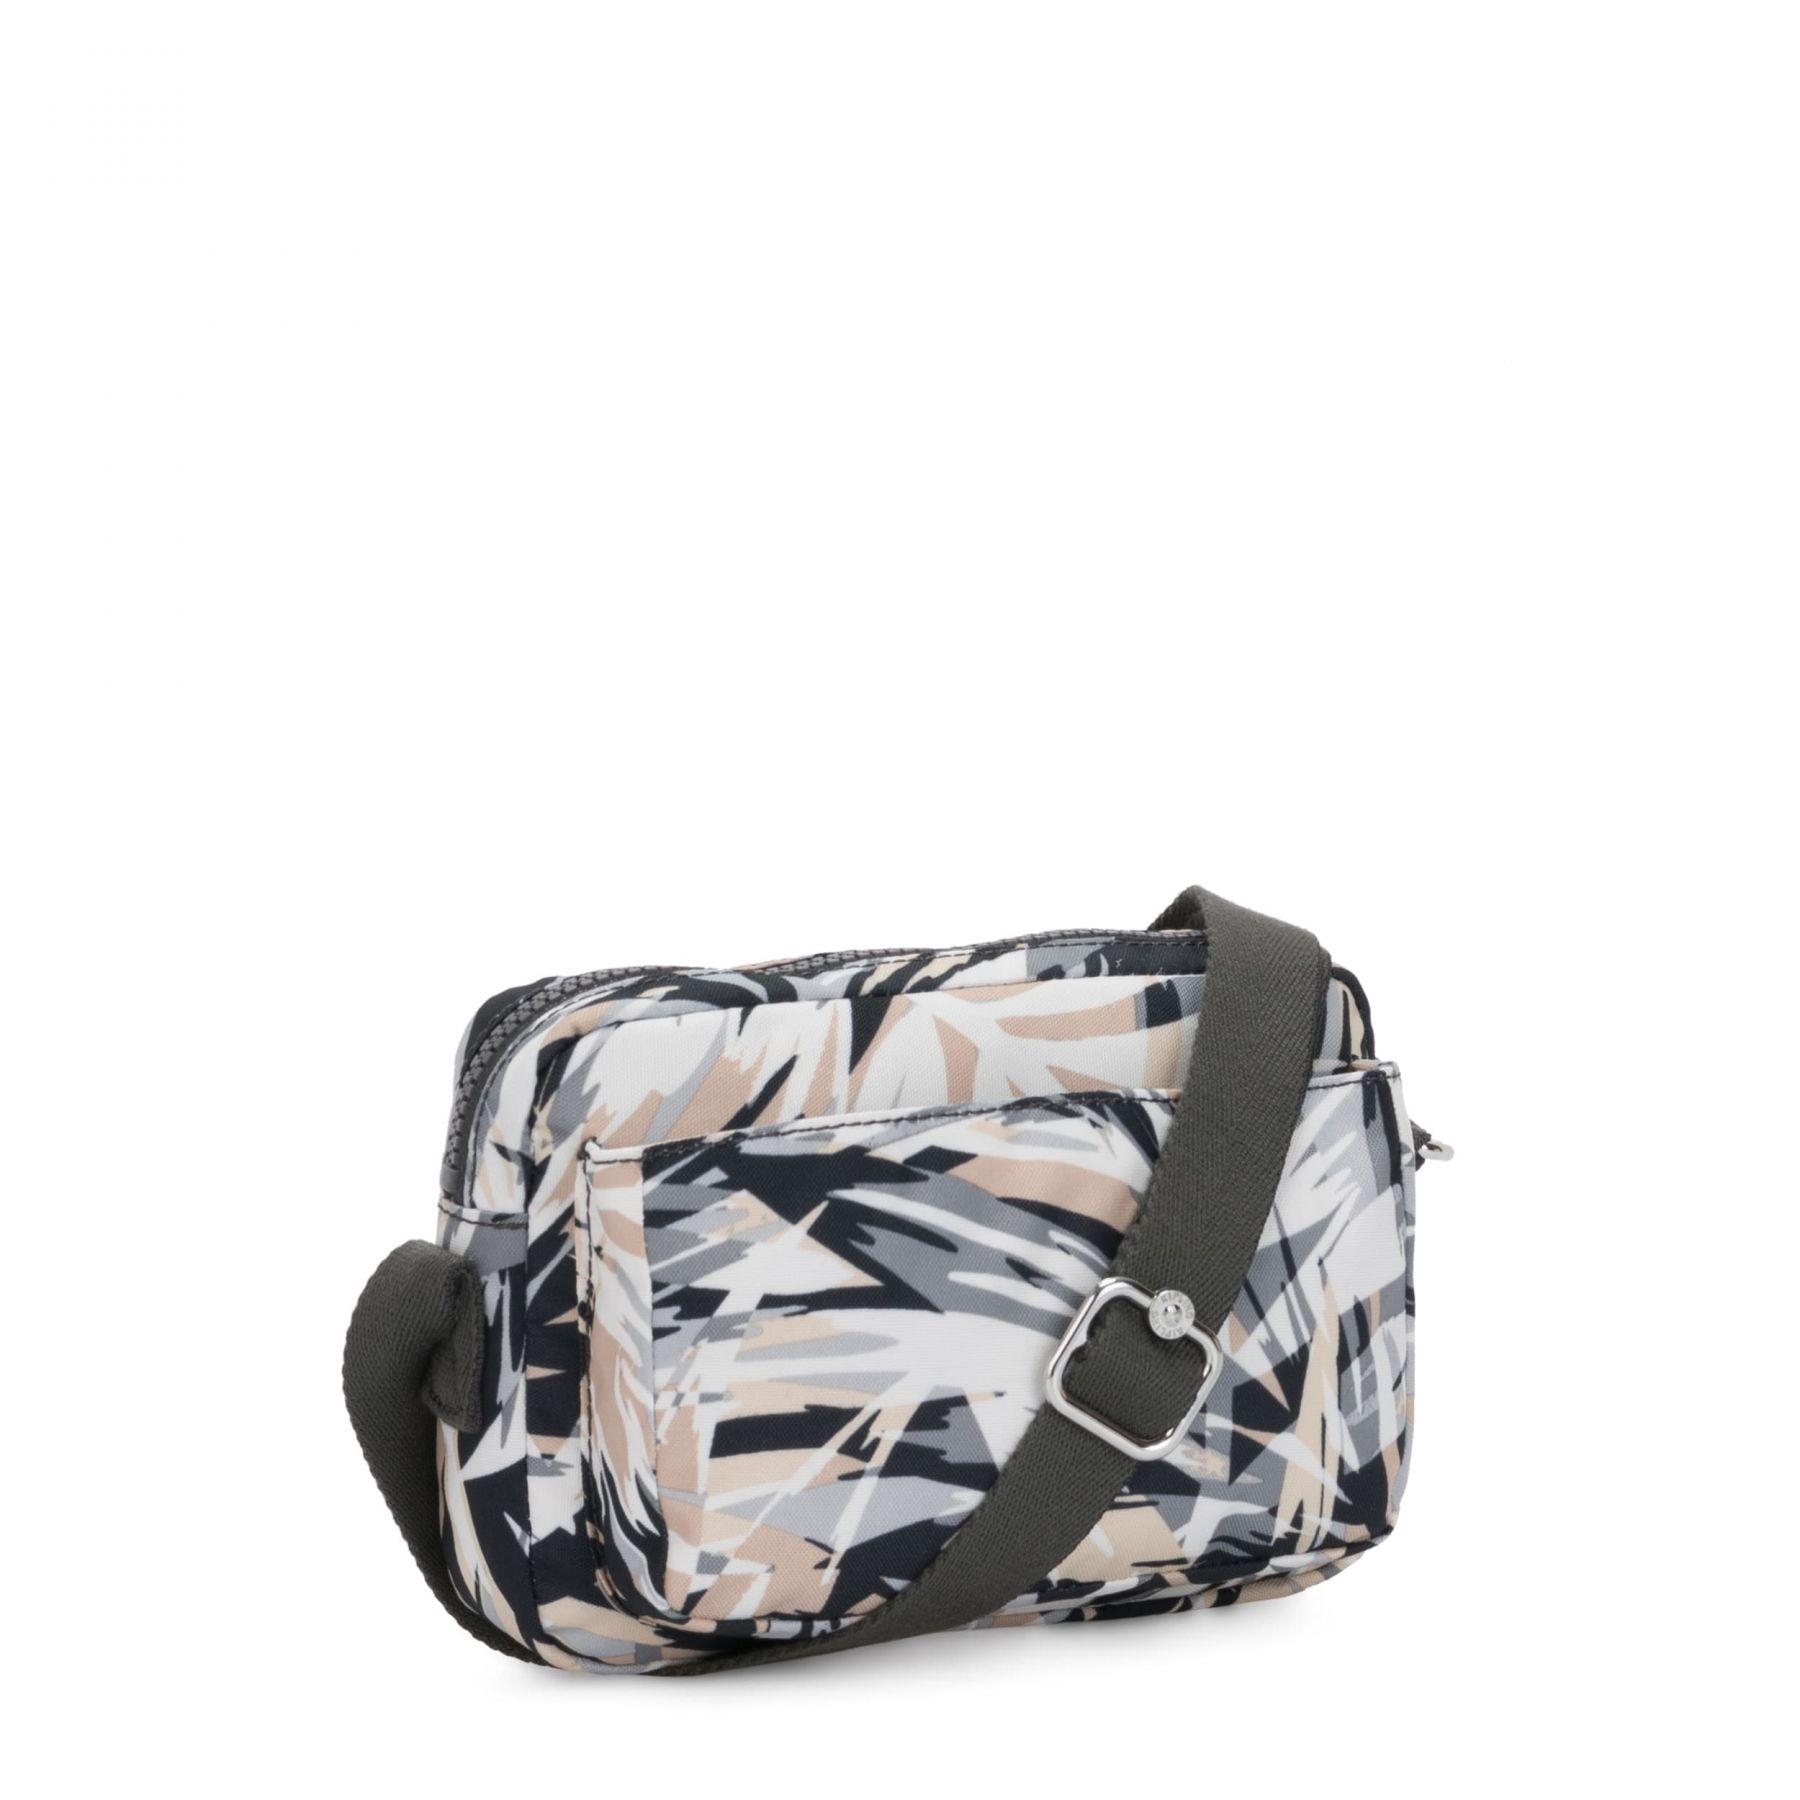 ABANU BAGS by Kipling